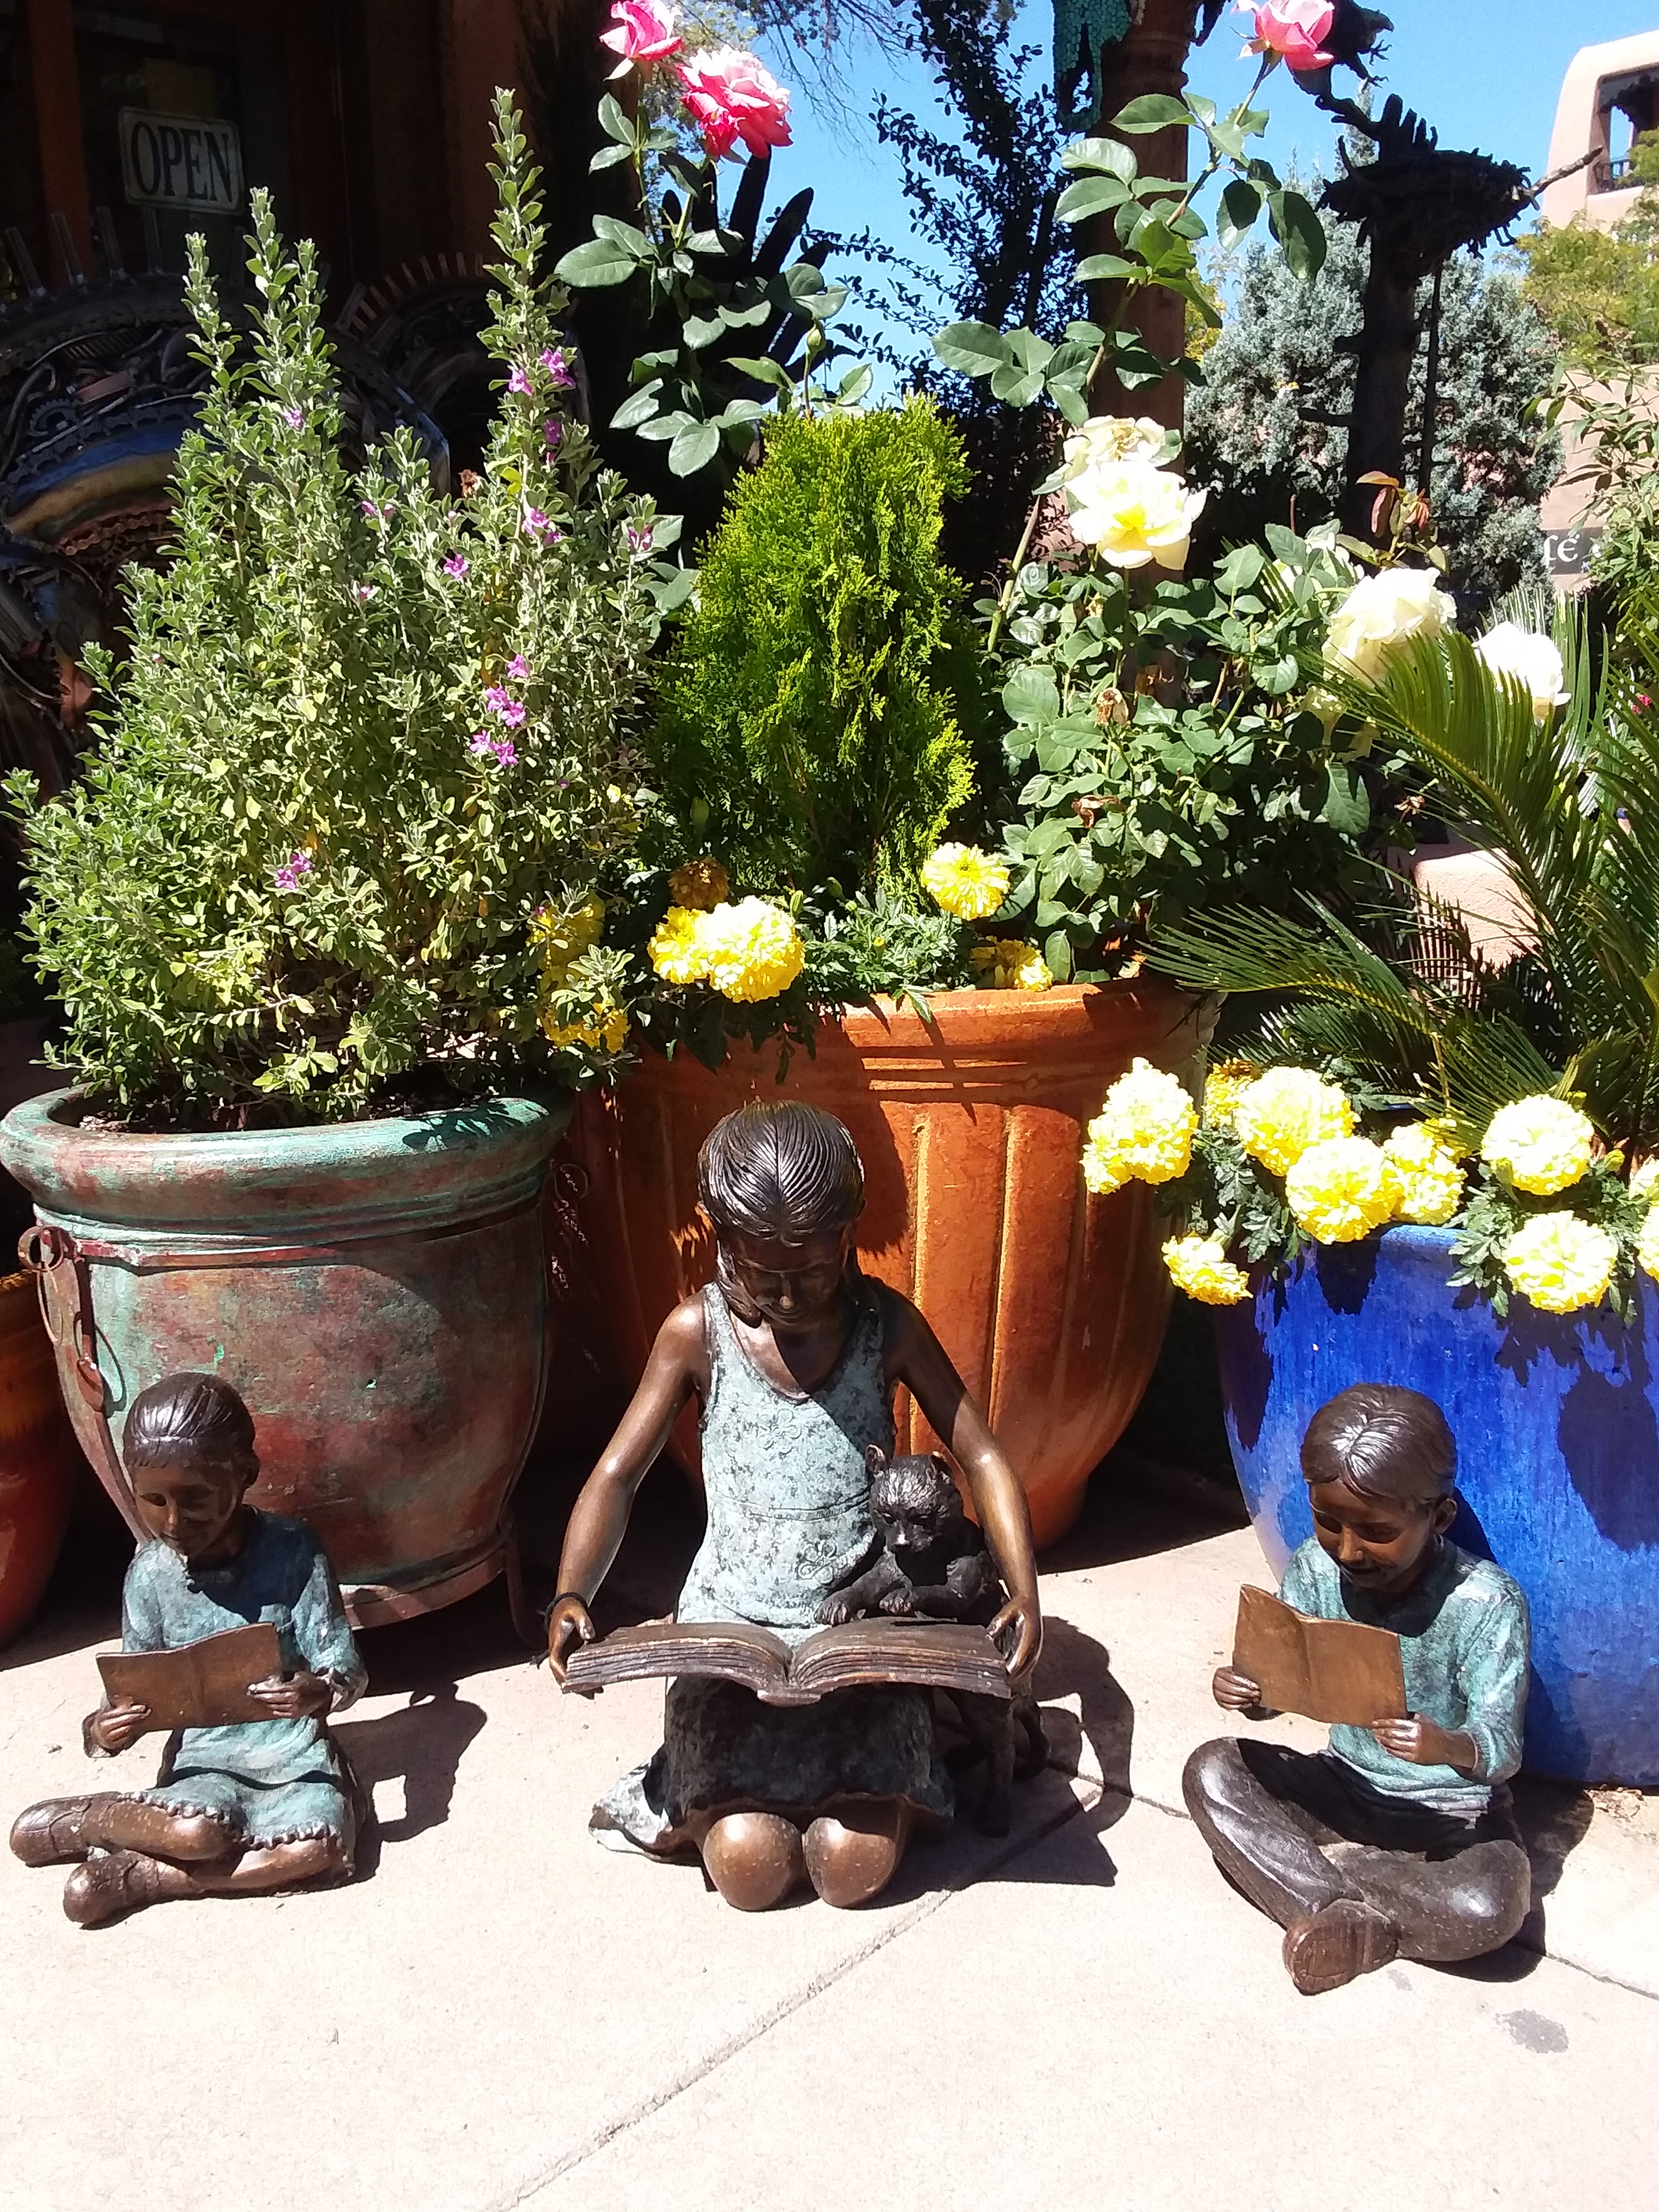 Sculpture - Santa Fe children